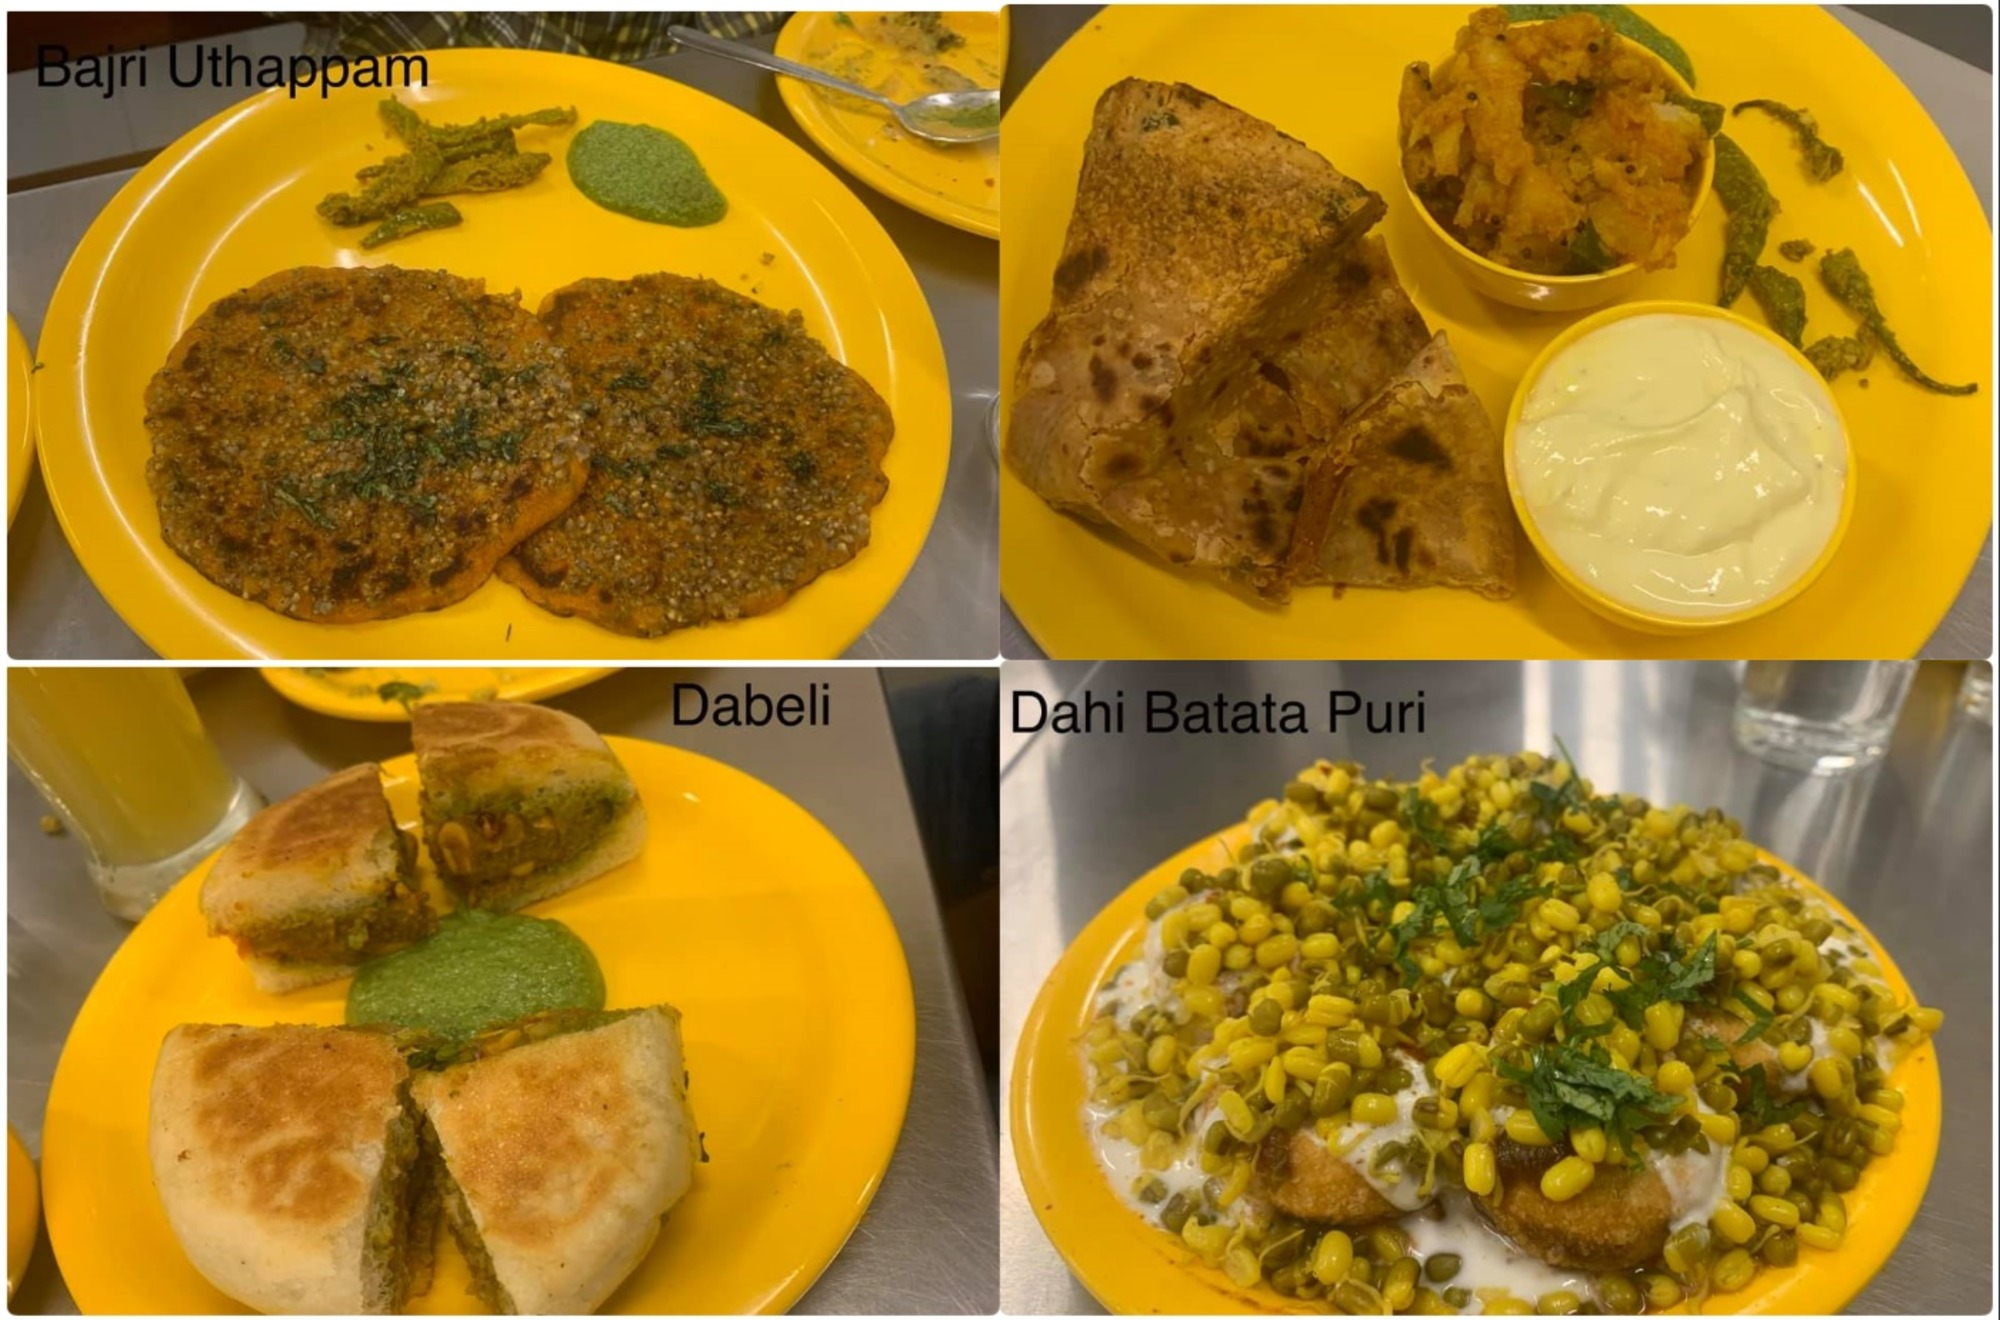 Bajri Uthappam, Roti, Dabeli & Dahi Batata Puri